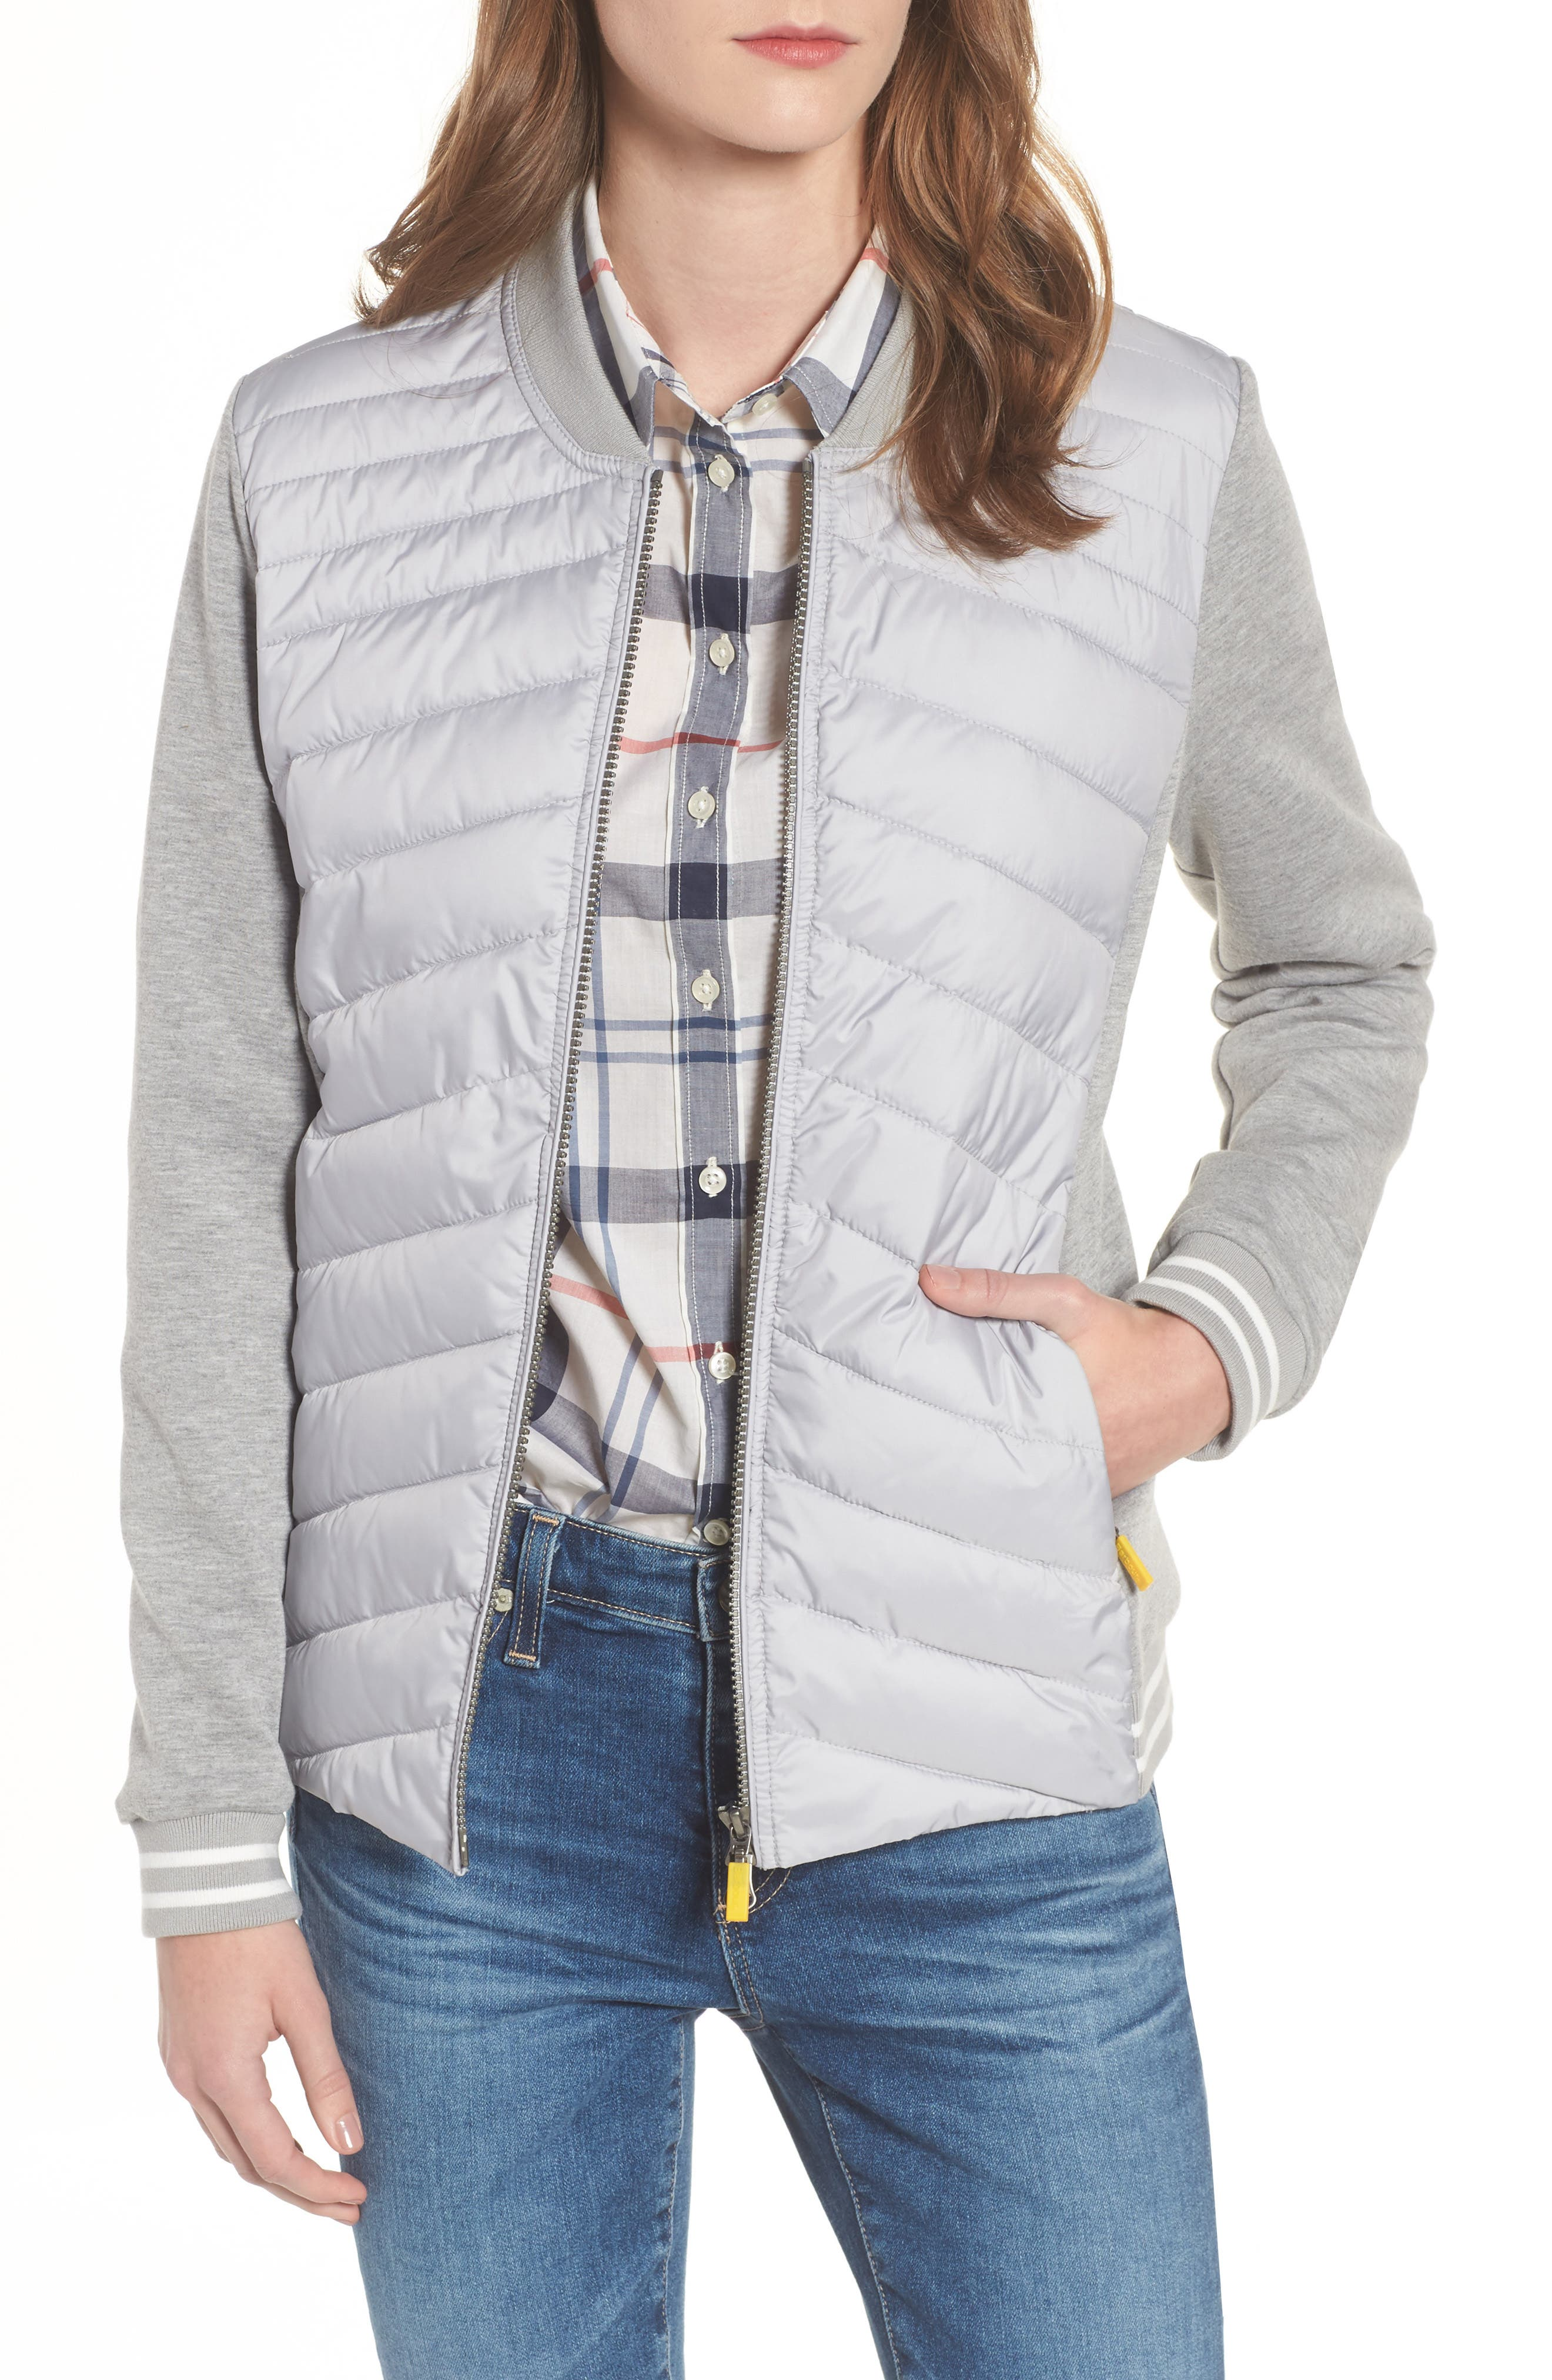 Pembrey Sweatshirt Jacket,                             Main thumbnail 1, color,                             Ice White